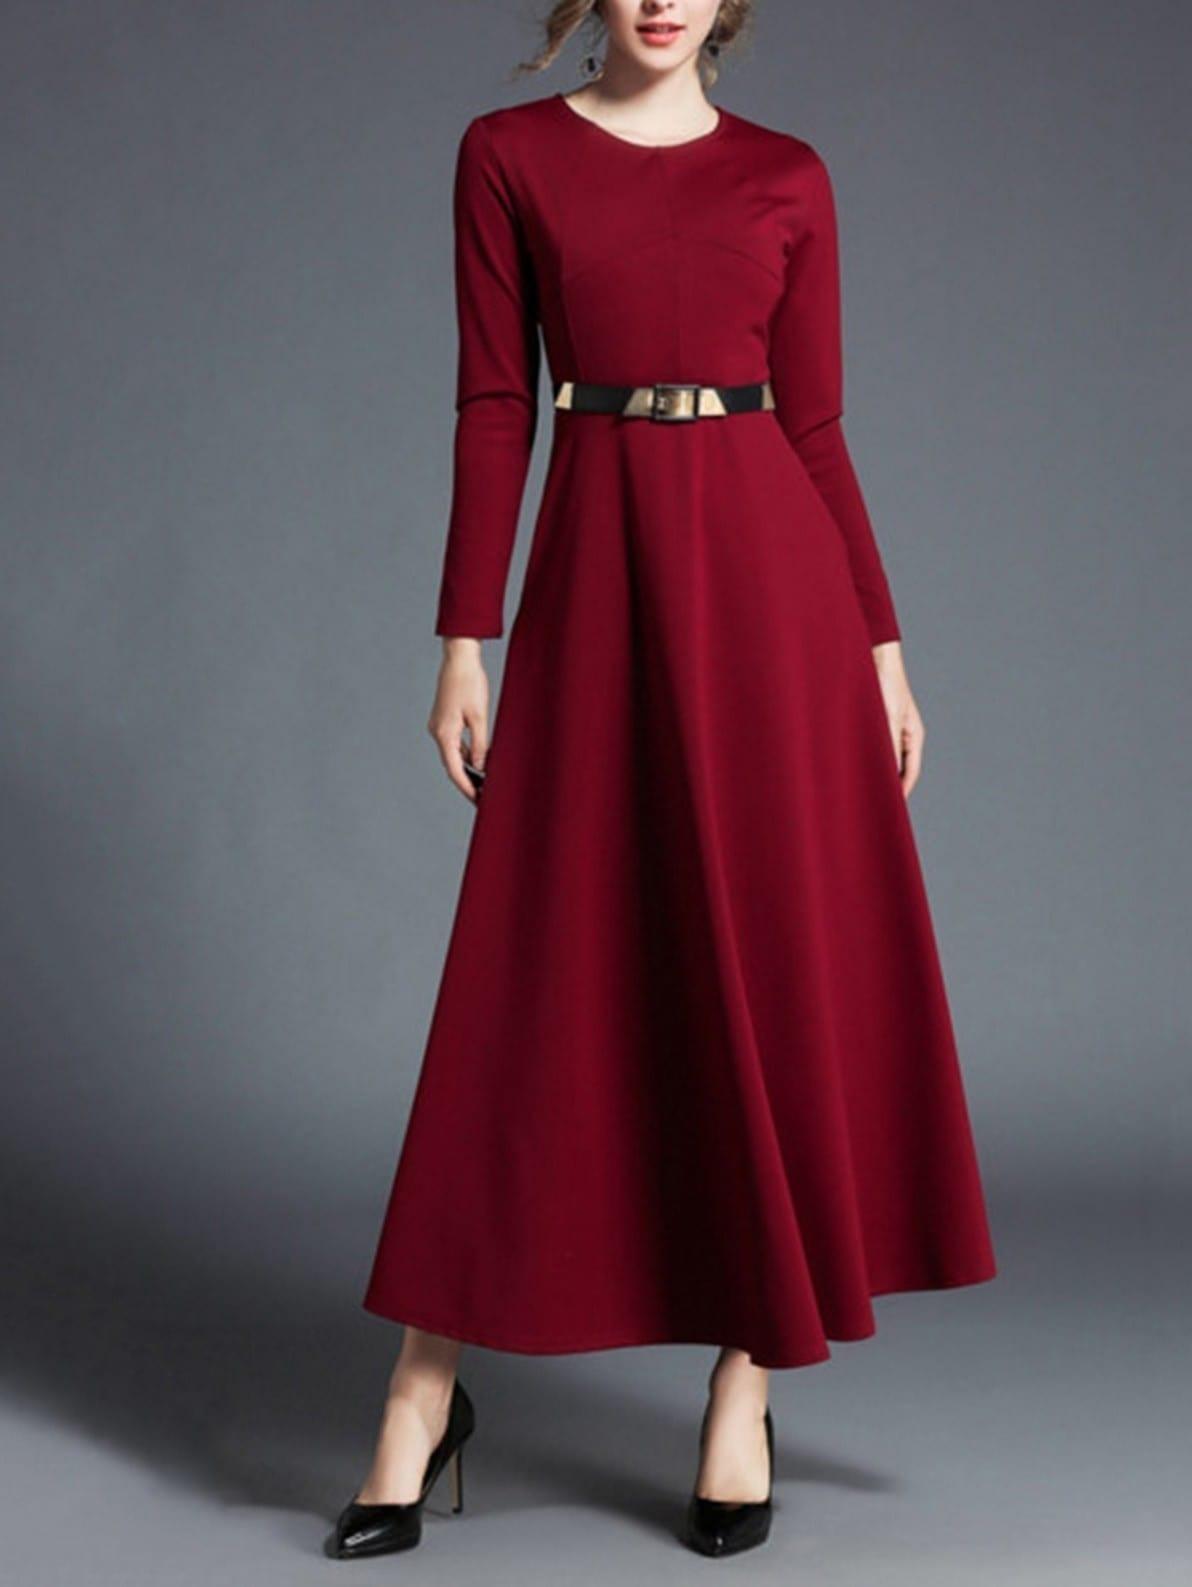 Longline Dress With Belt